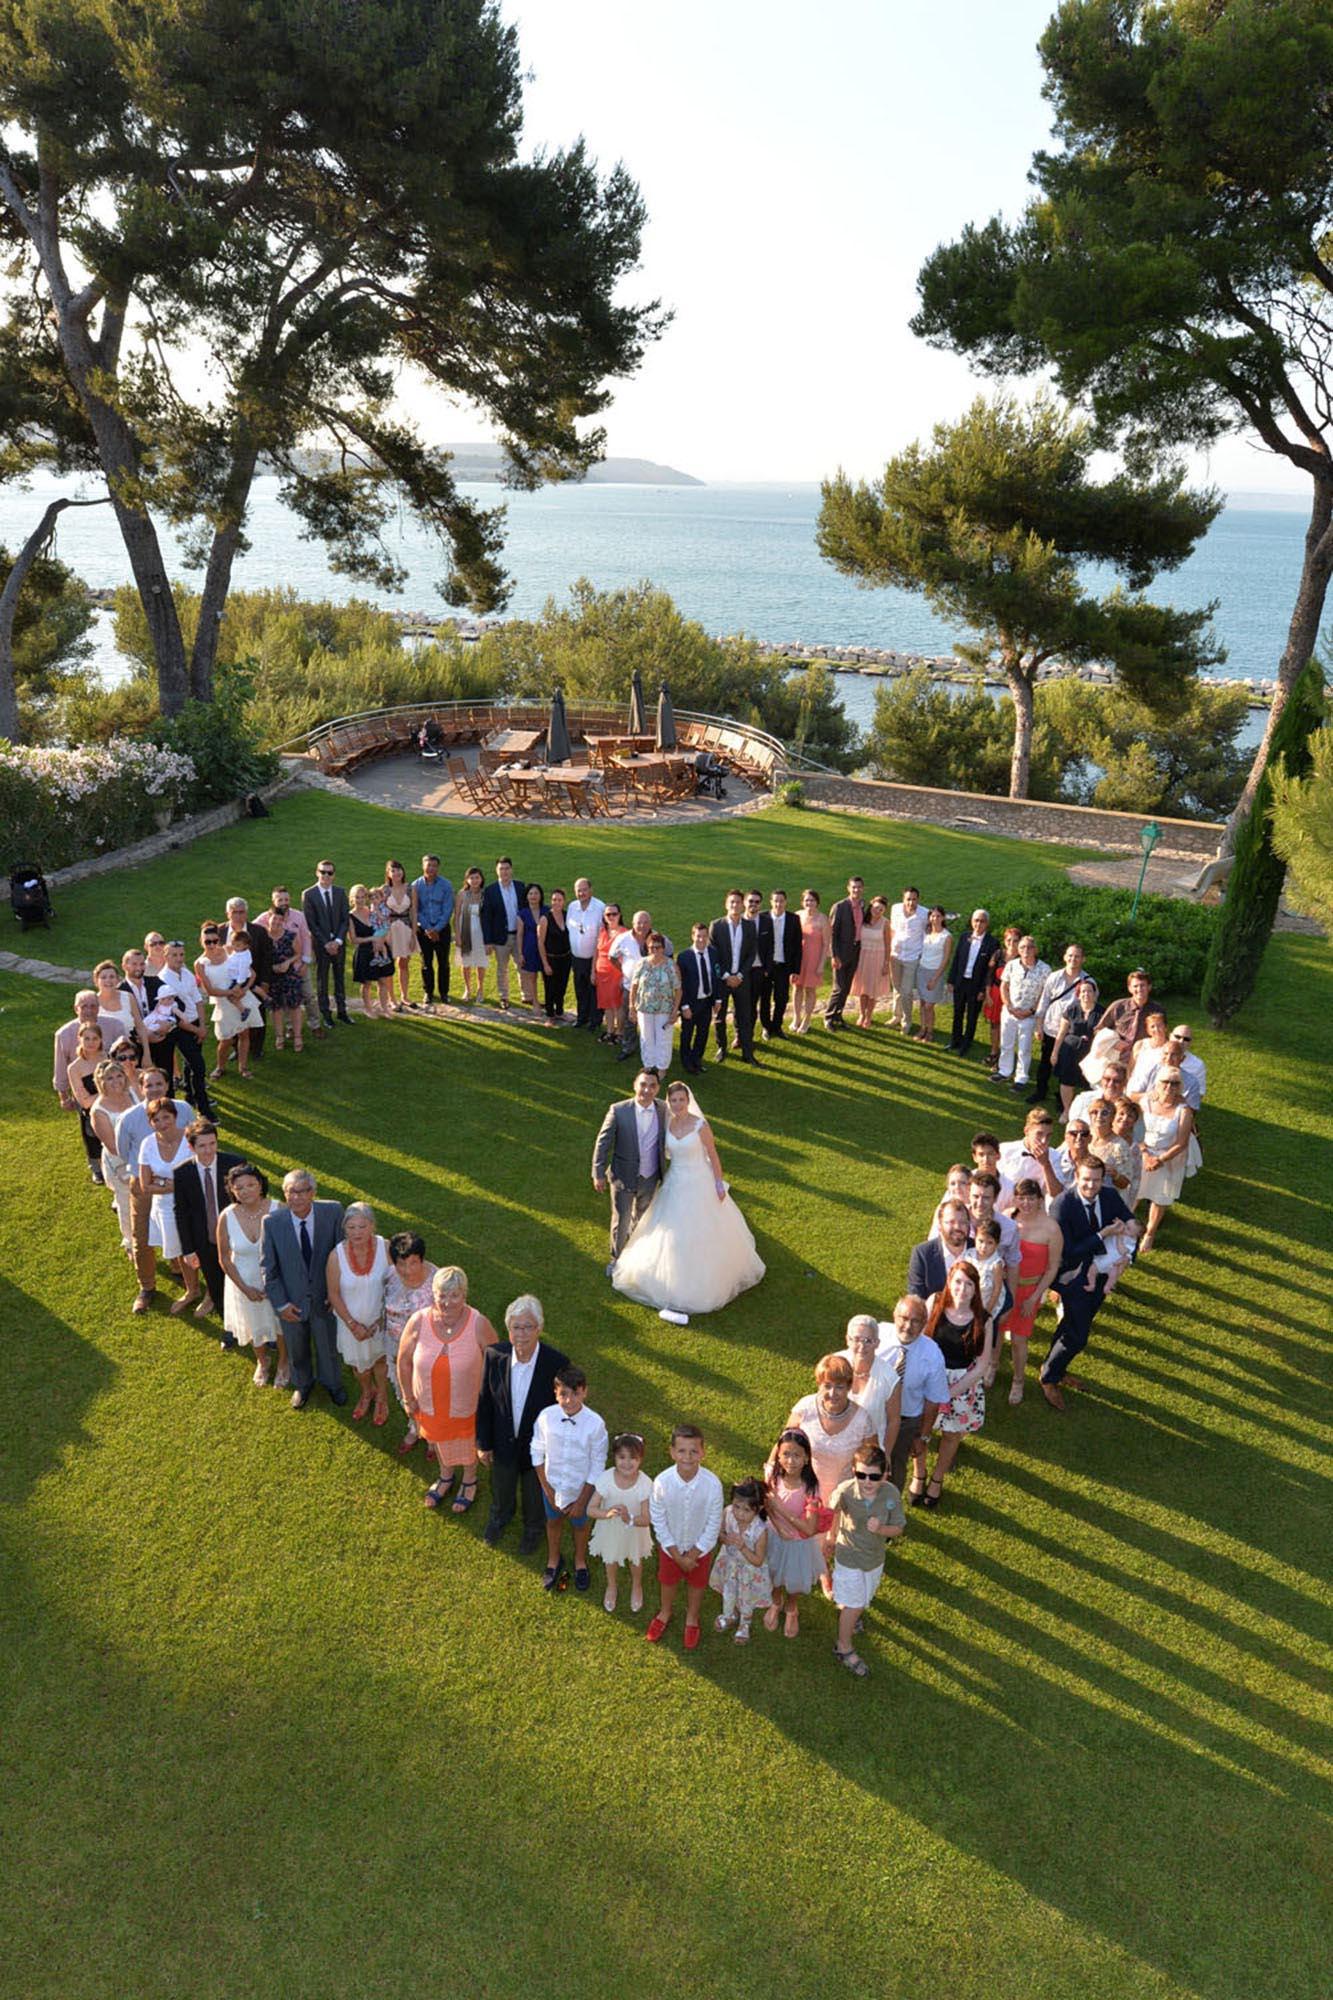 photographe-mariage-13-photo-groupe-coeur